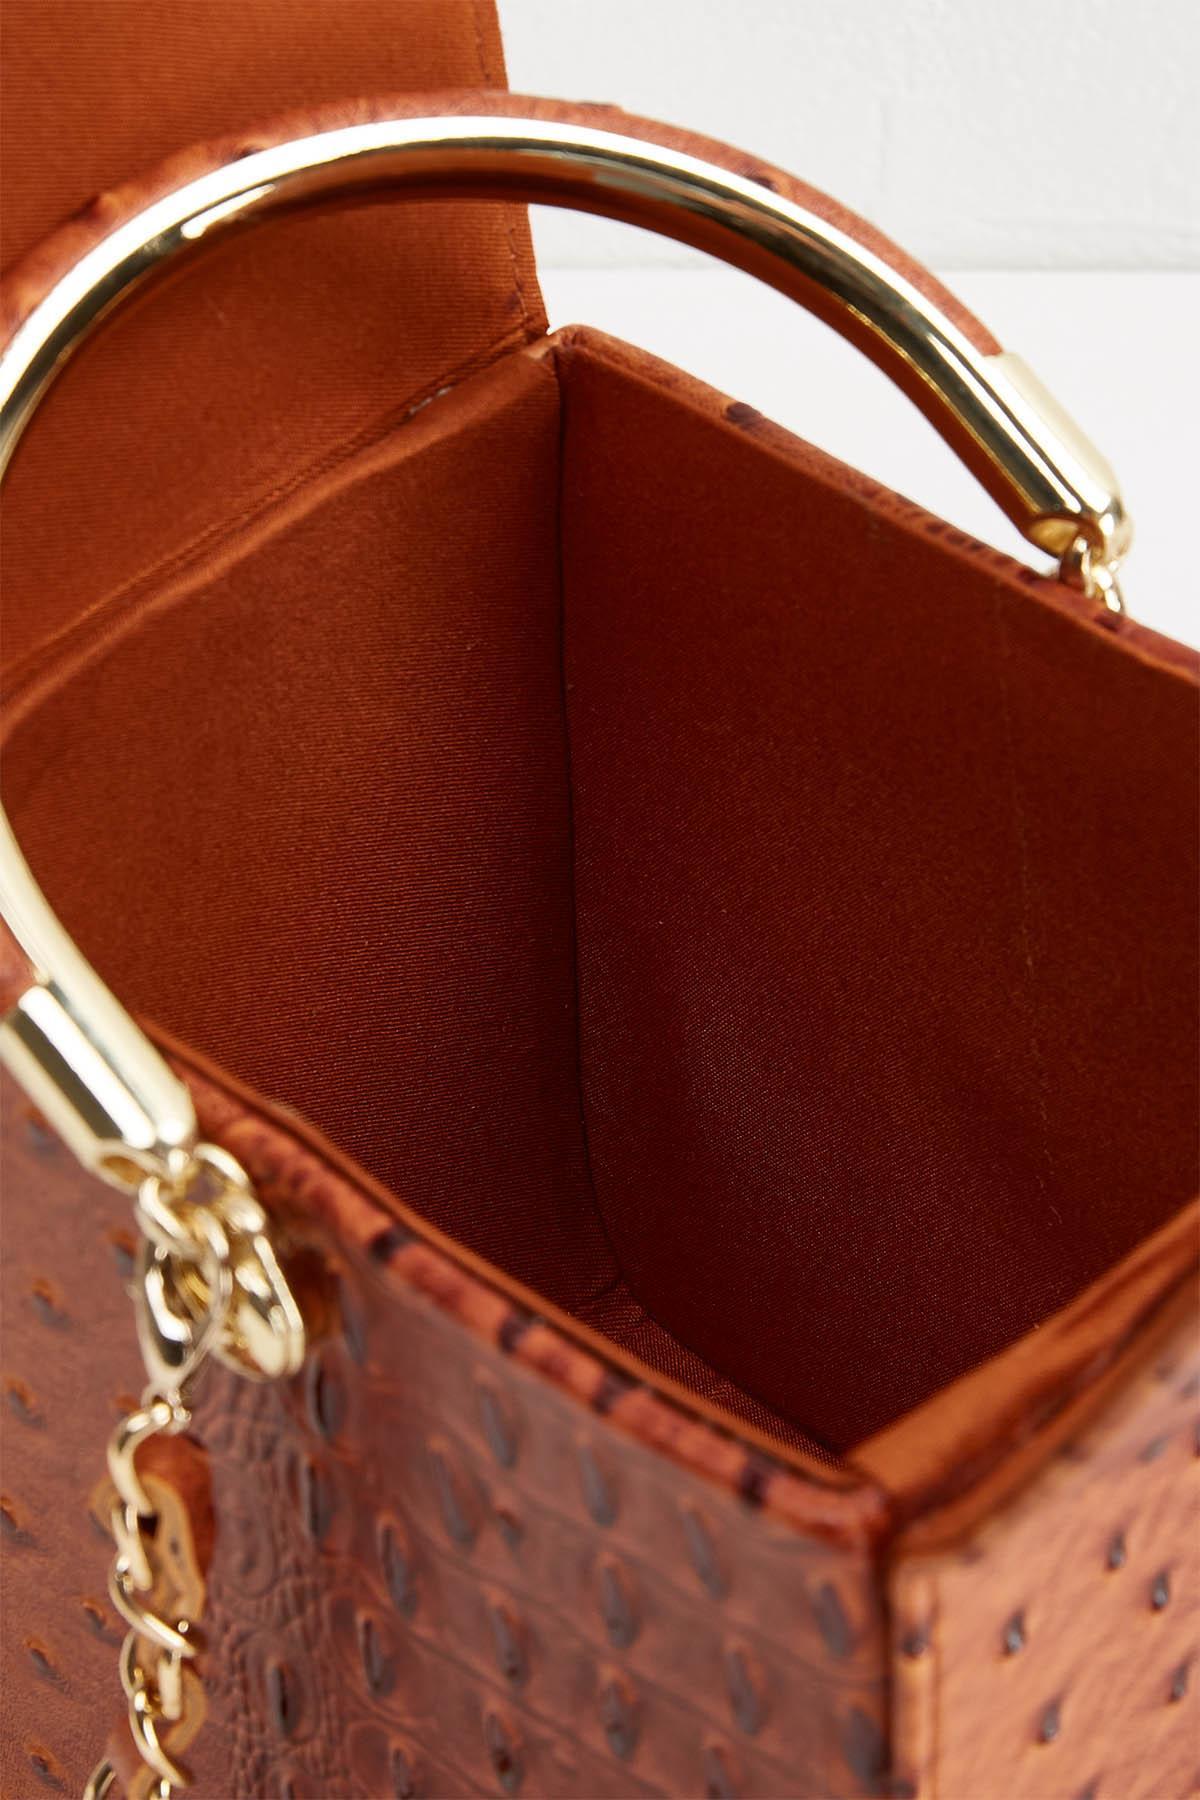 Takeout Textured Handbag